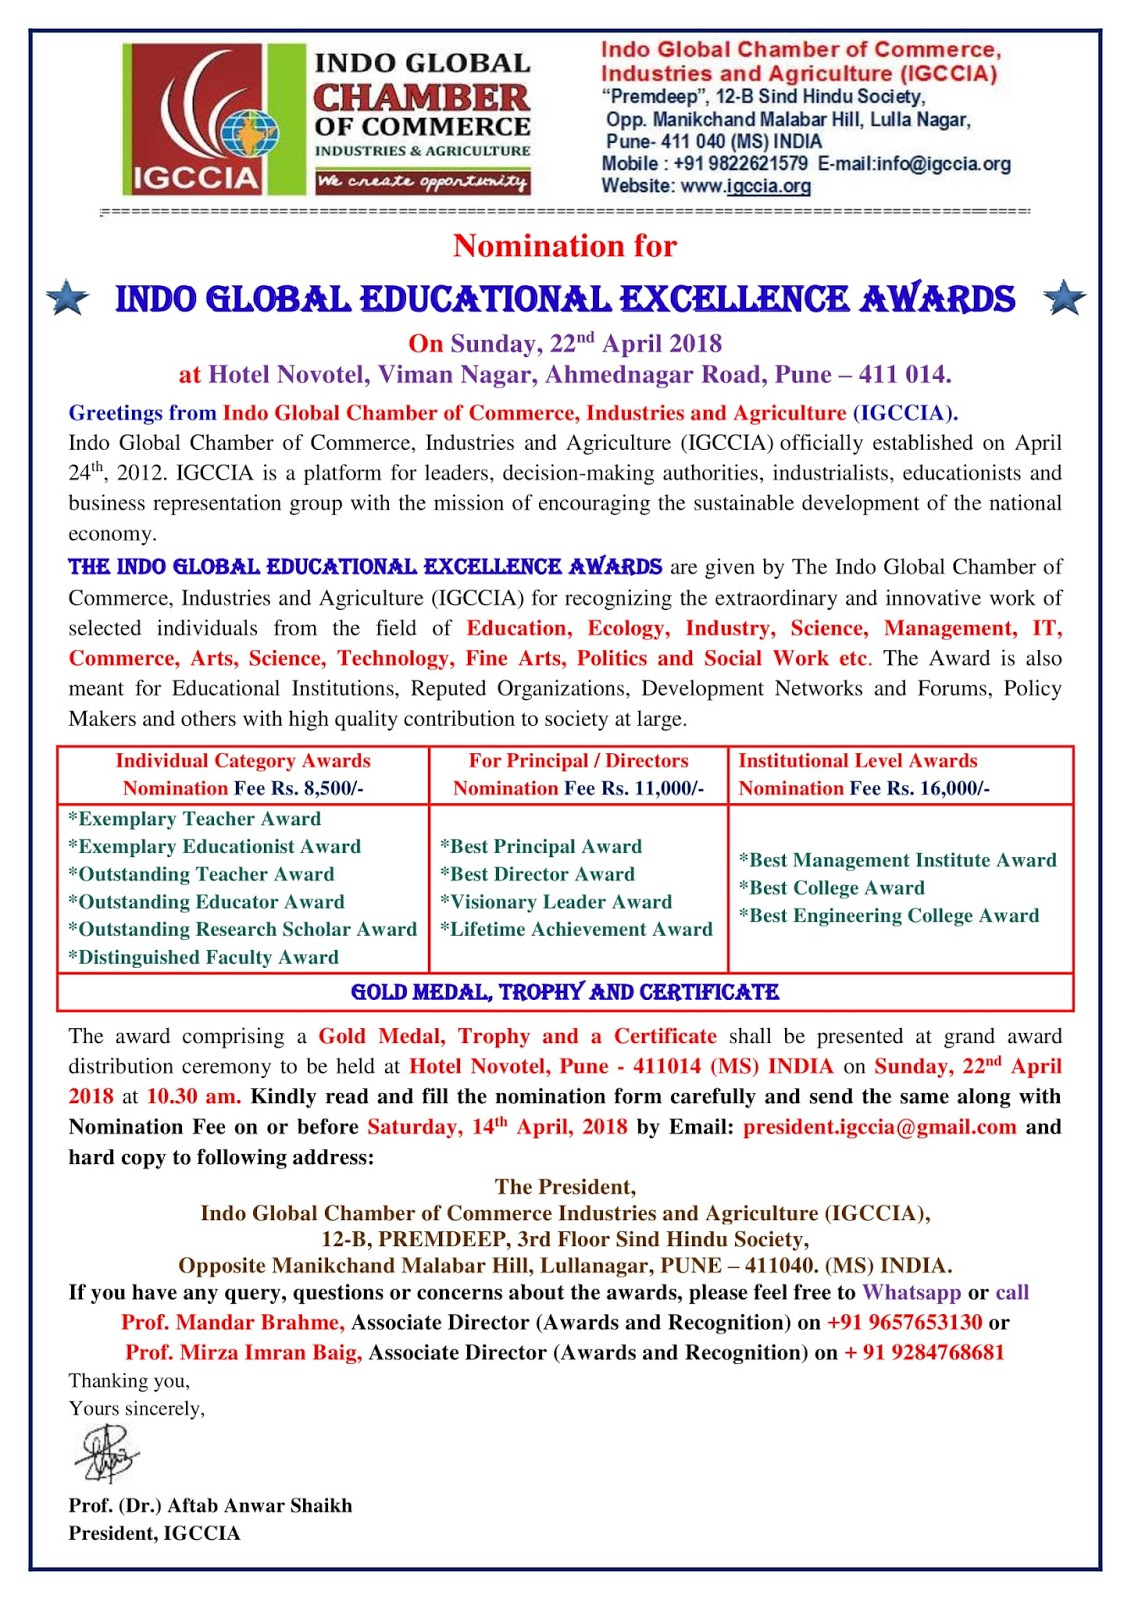 international research conference indo global educational excellence awards sunday 22nd april 2018 at hotel novotel viman nagar pune maharashtra